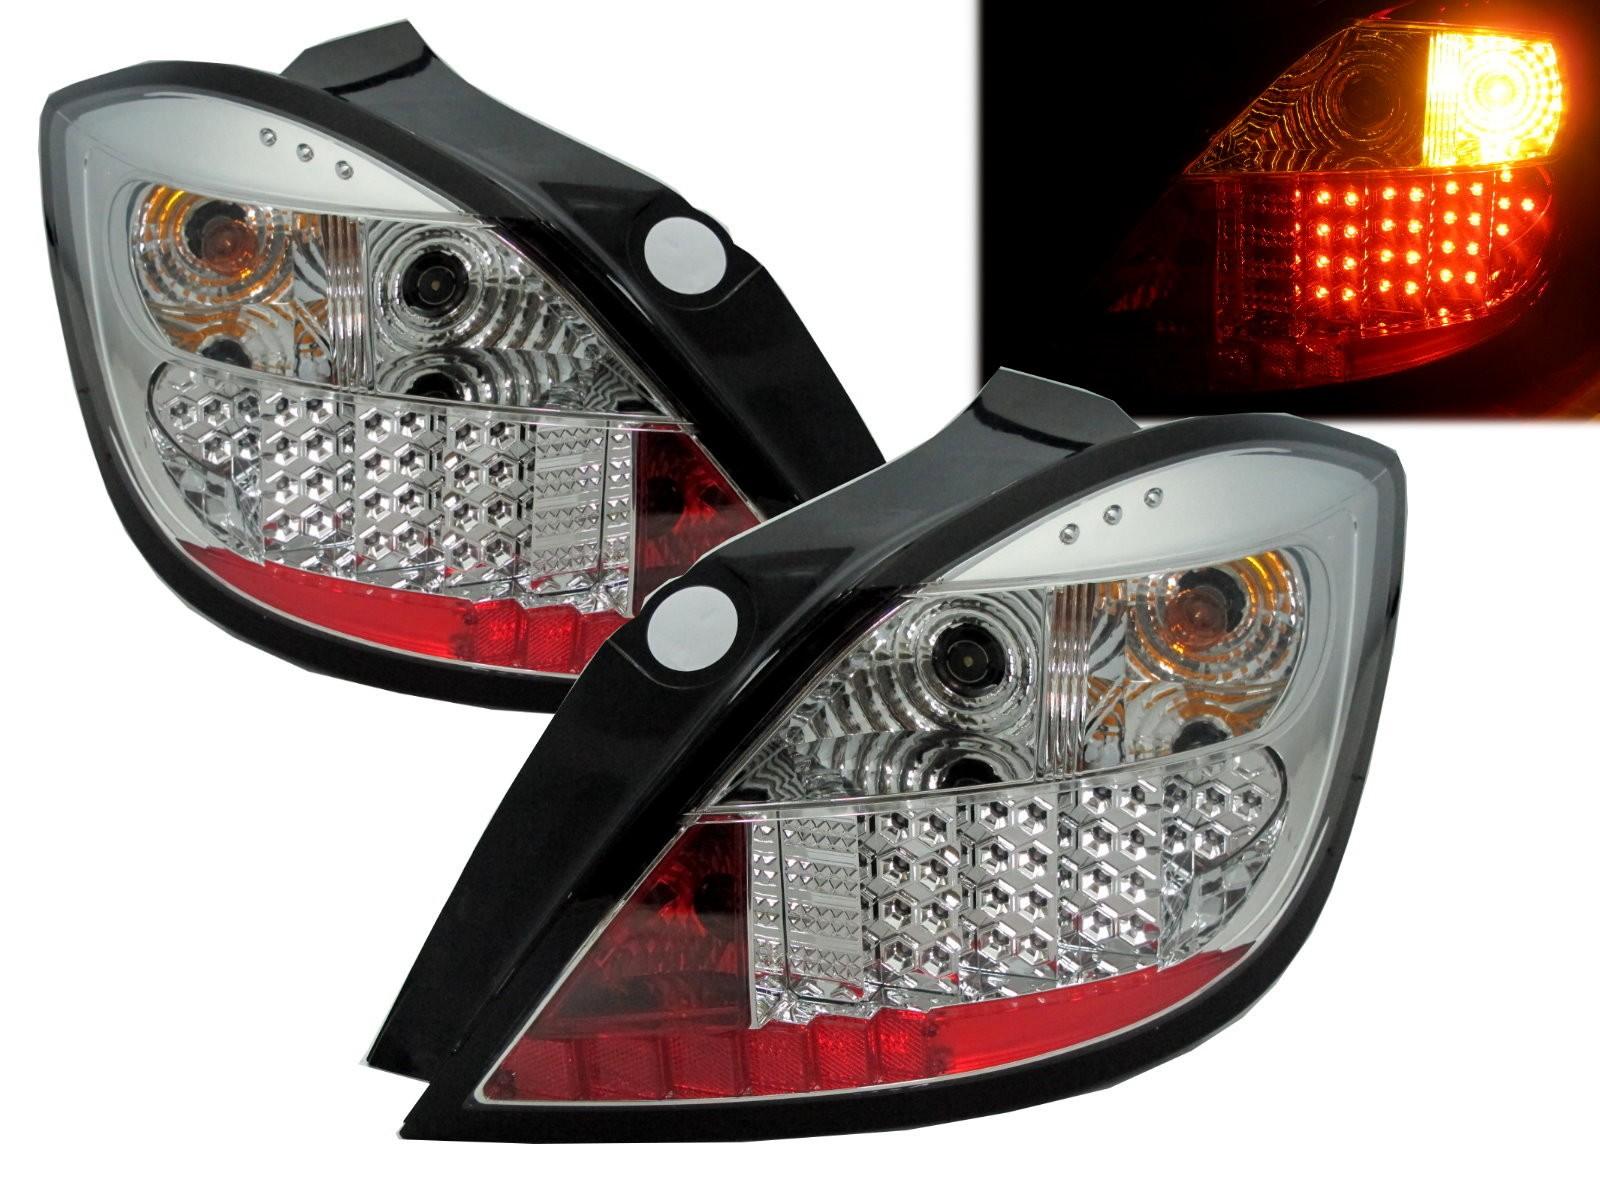 CrazyTheGod Astra 2004-2009 Hatchback 5D LED Tail Rear Light Chrome for CHEVROLET CHEVY